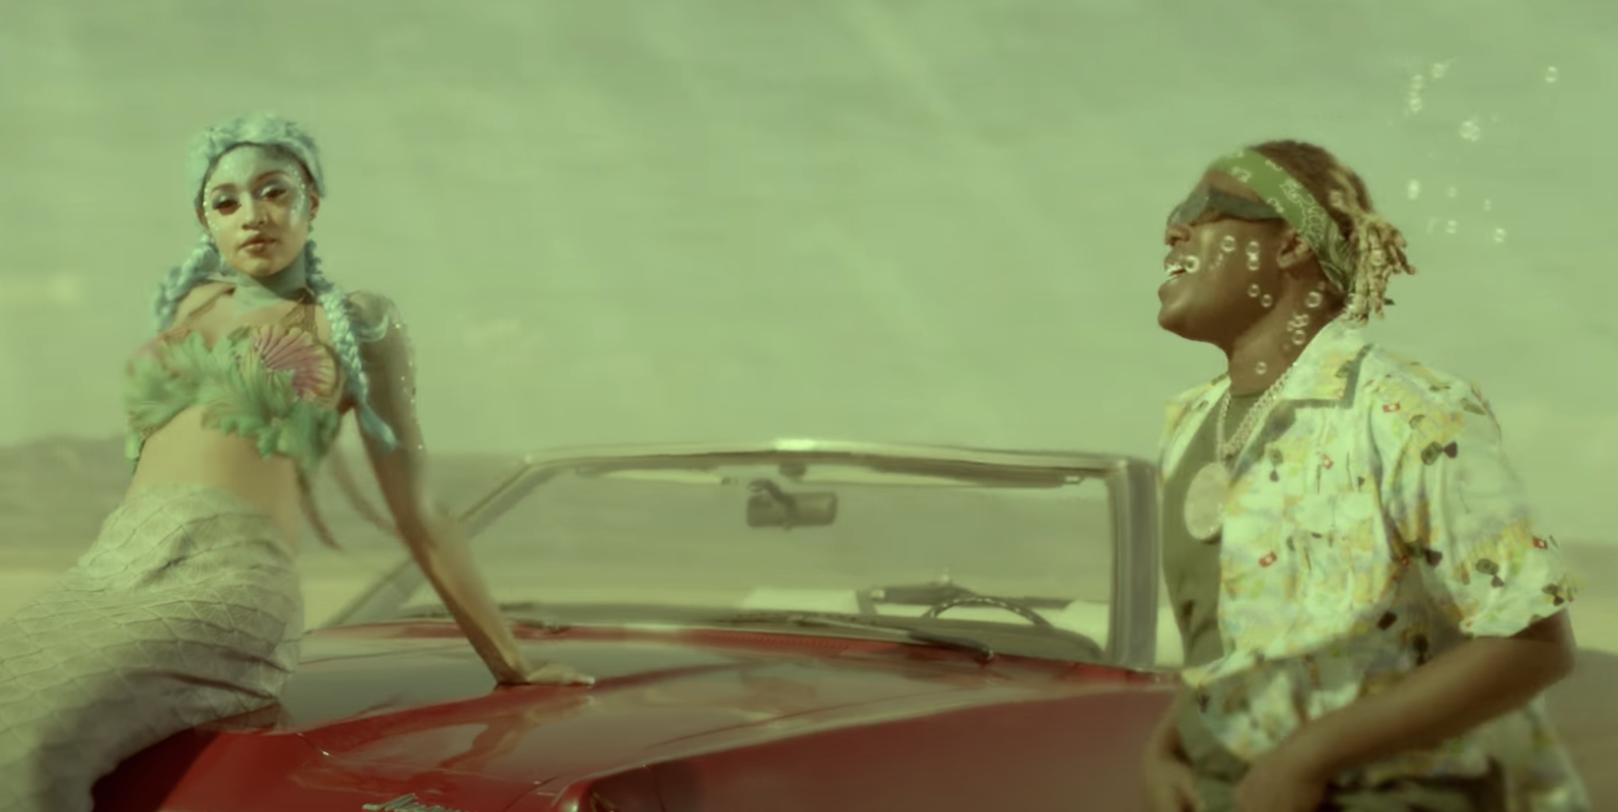 Don Toliver, Gunna & Nav - Lemonade (Video) | 16BARS